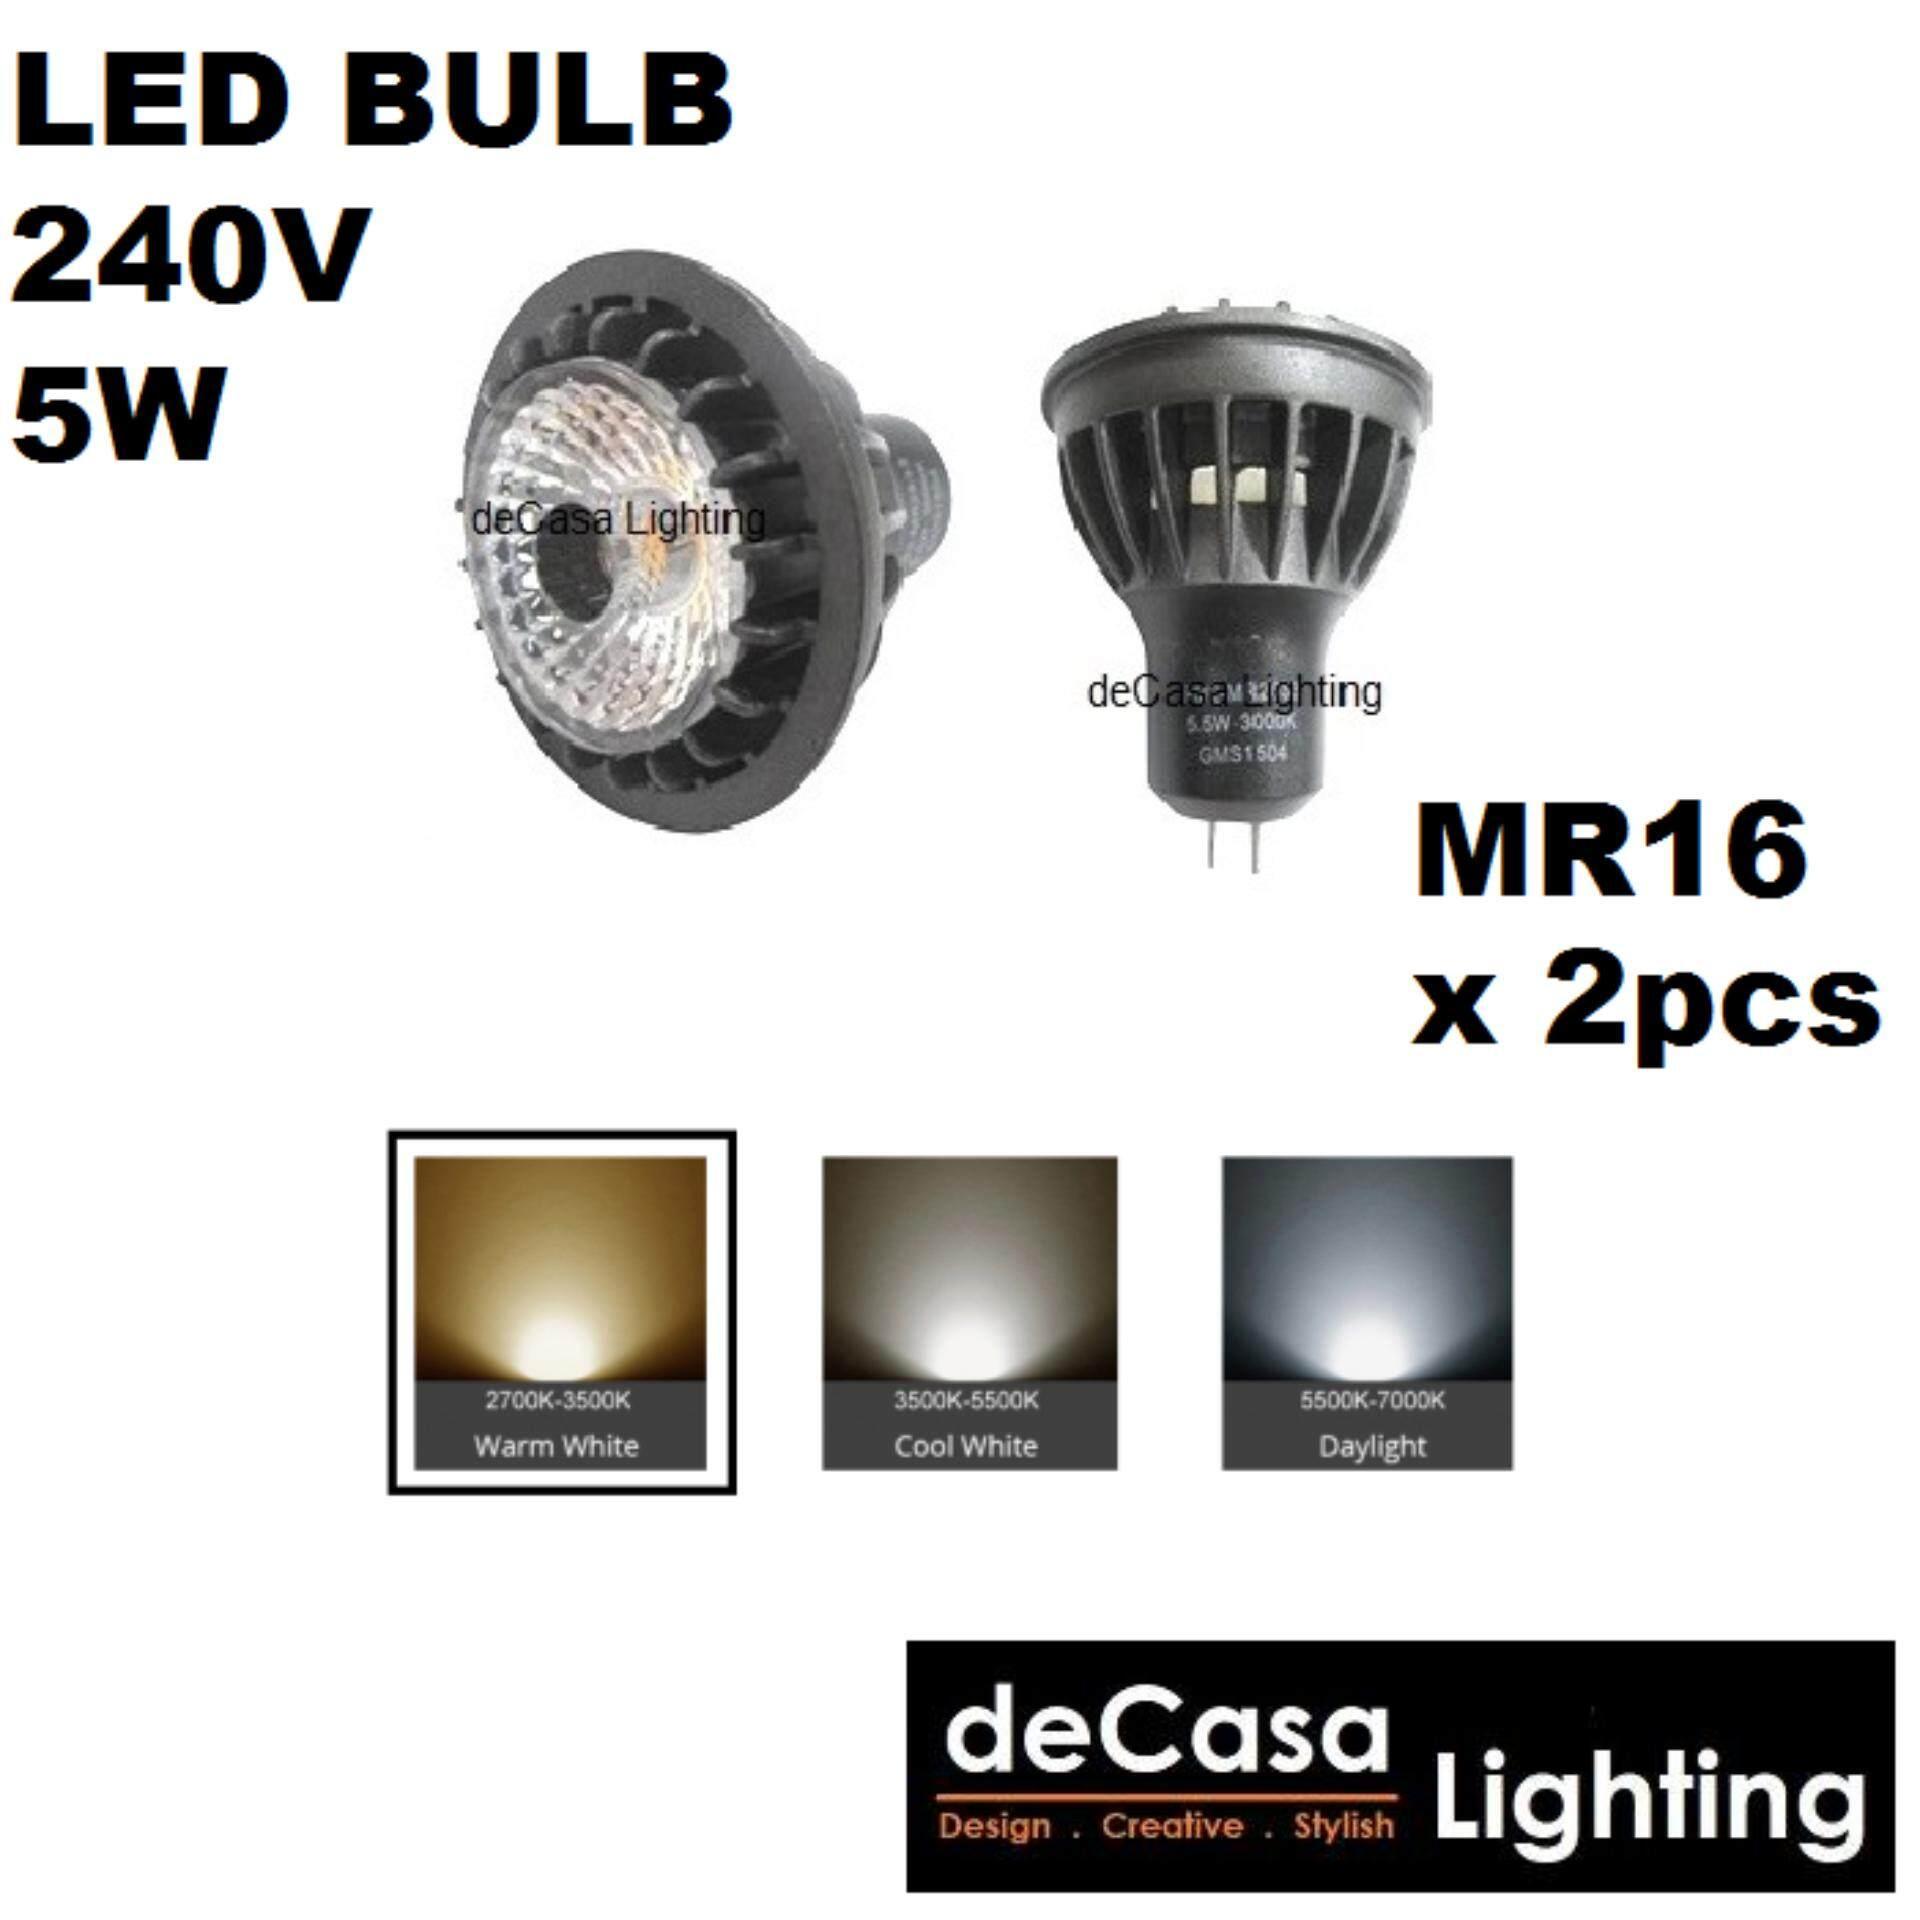 2PCS 5W Led Bulb 240v MR16 Led Bulb Warm White MR16 Holder Spotlight Bulb (CM-MR16-5W-WW)